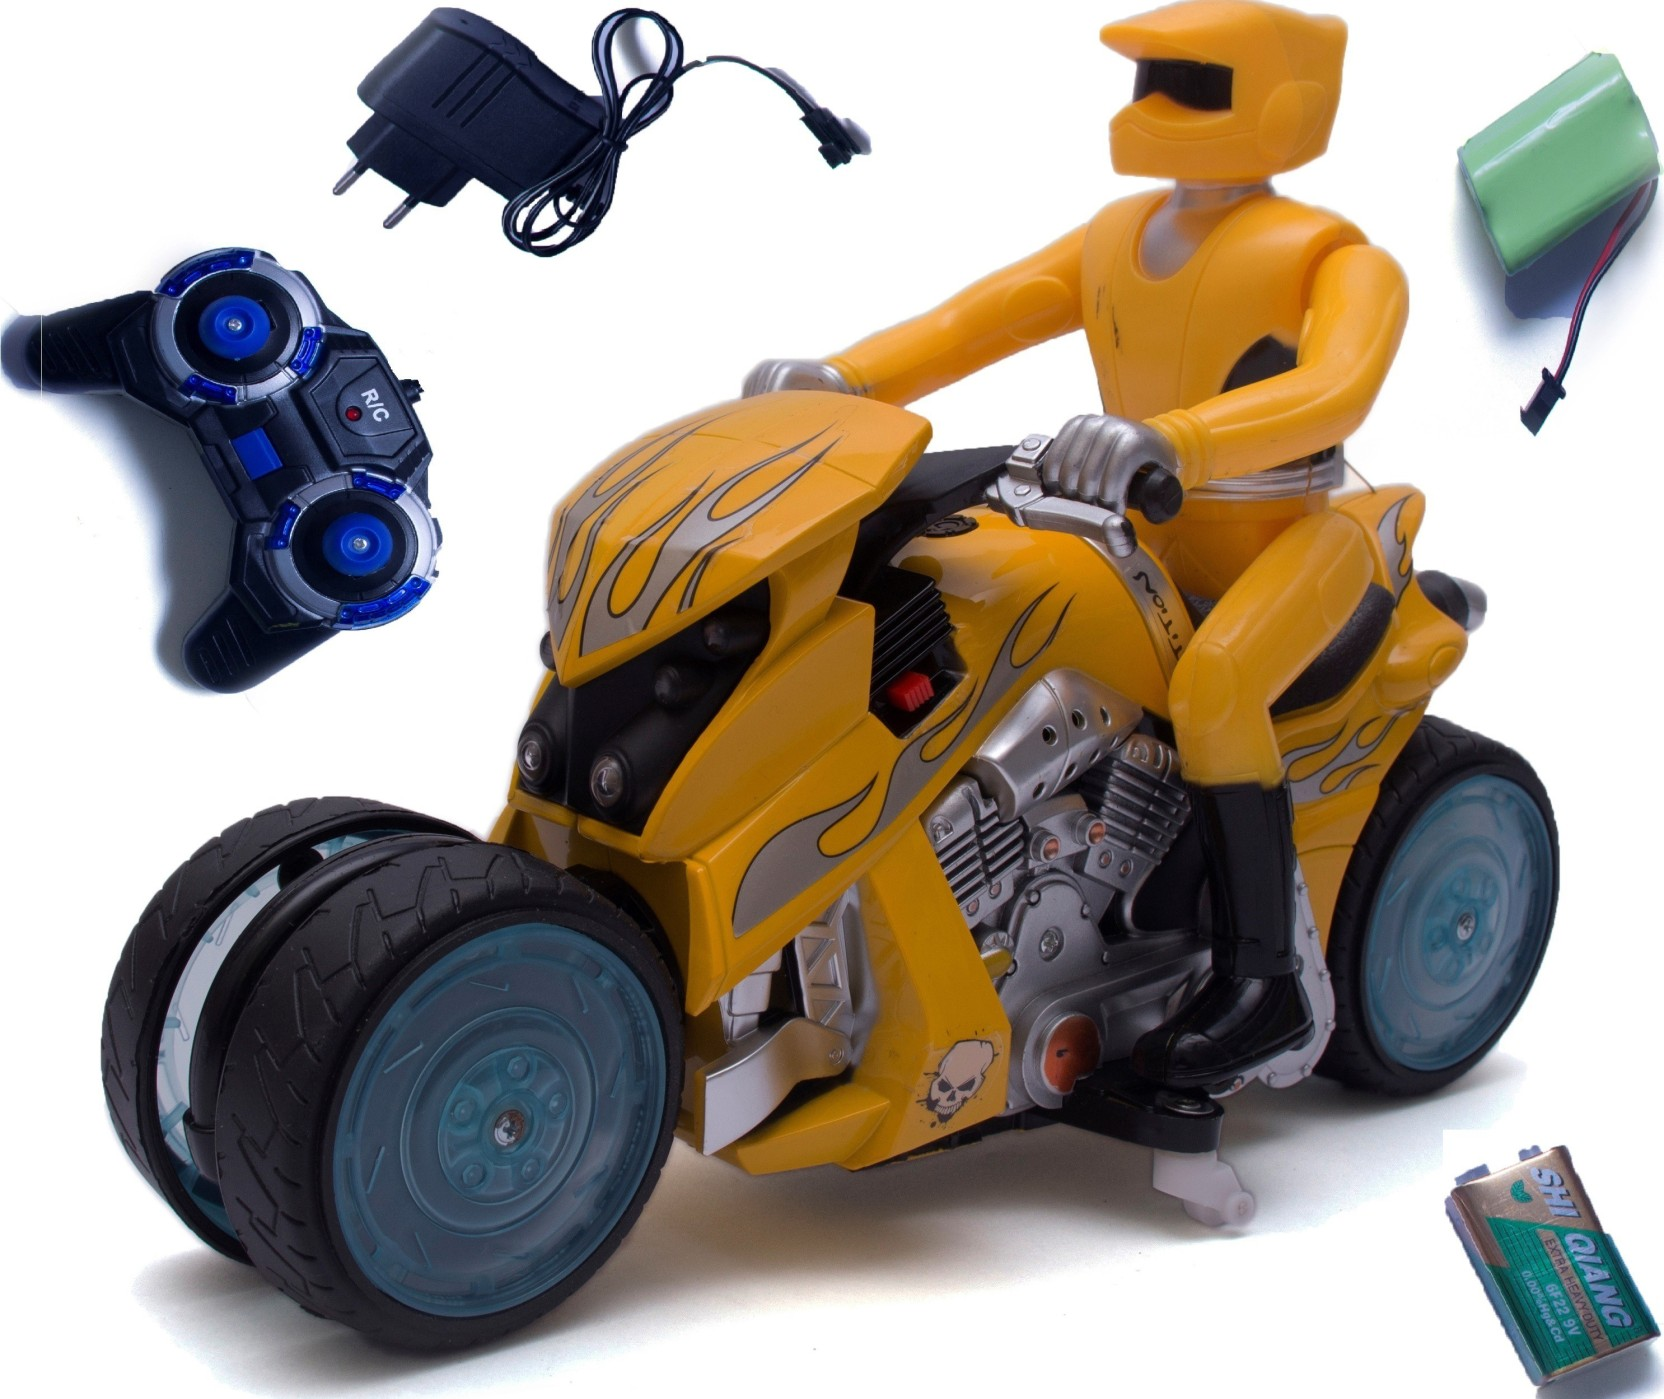 TWGE Remote Control Bike-Drift Motorcycle-360 Degree Drift